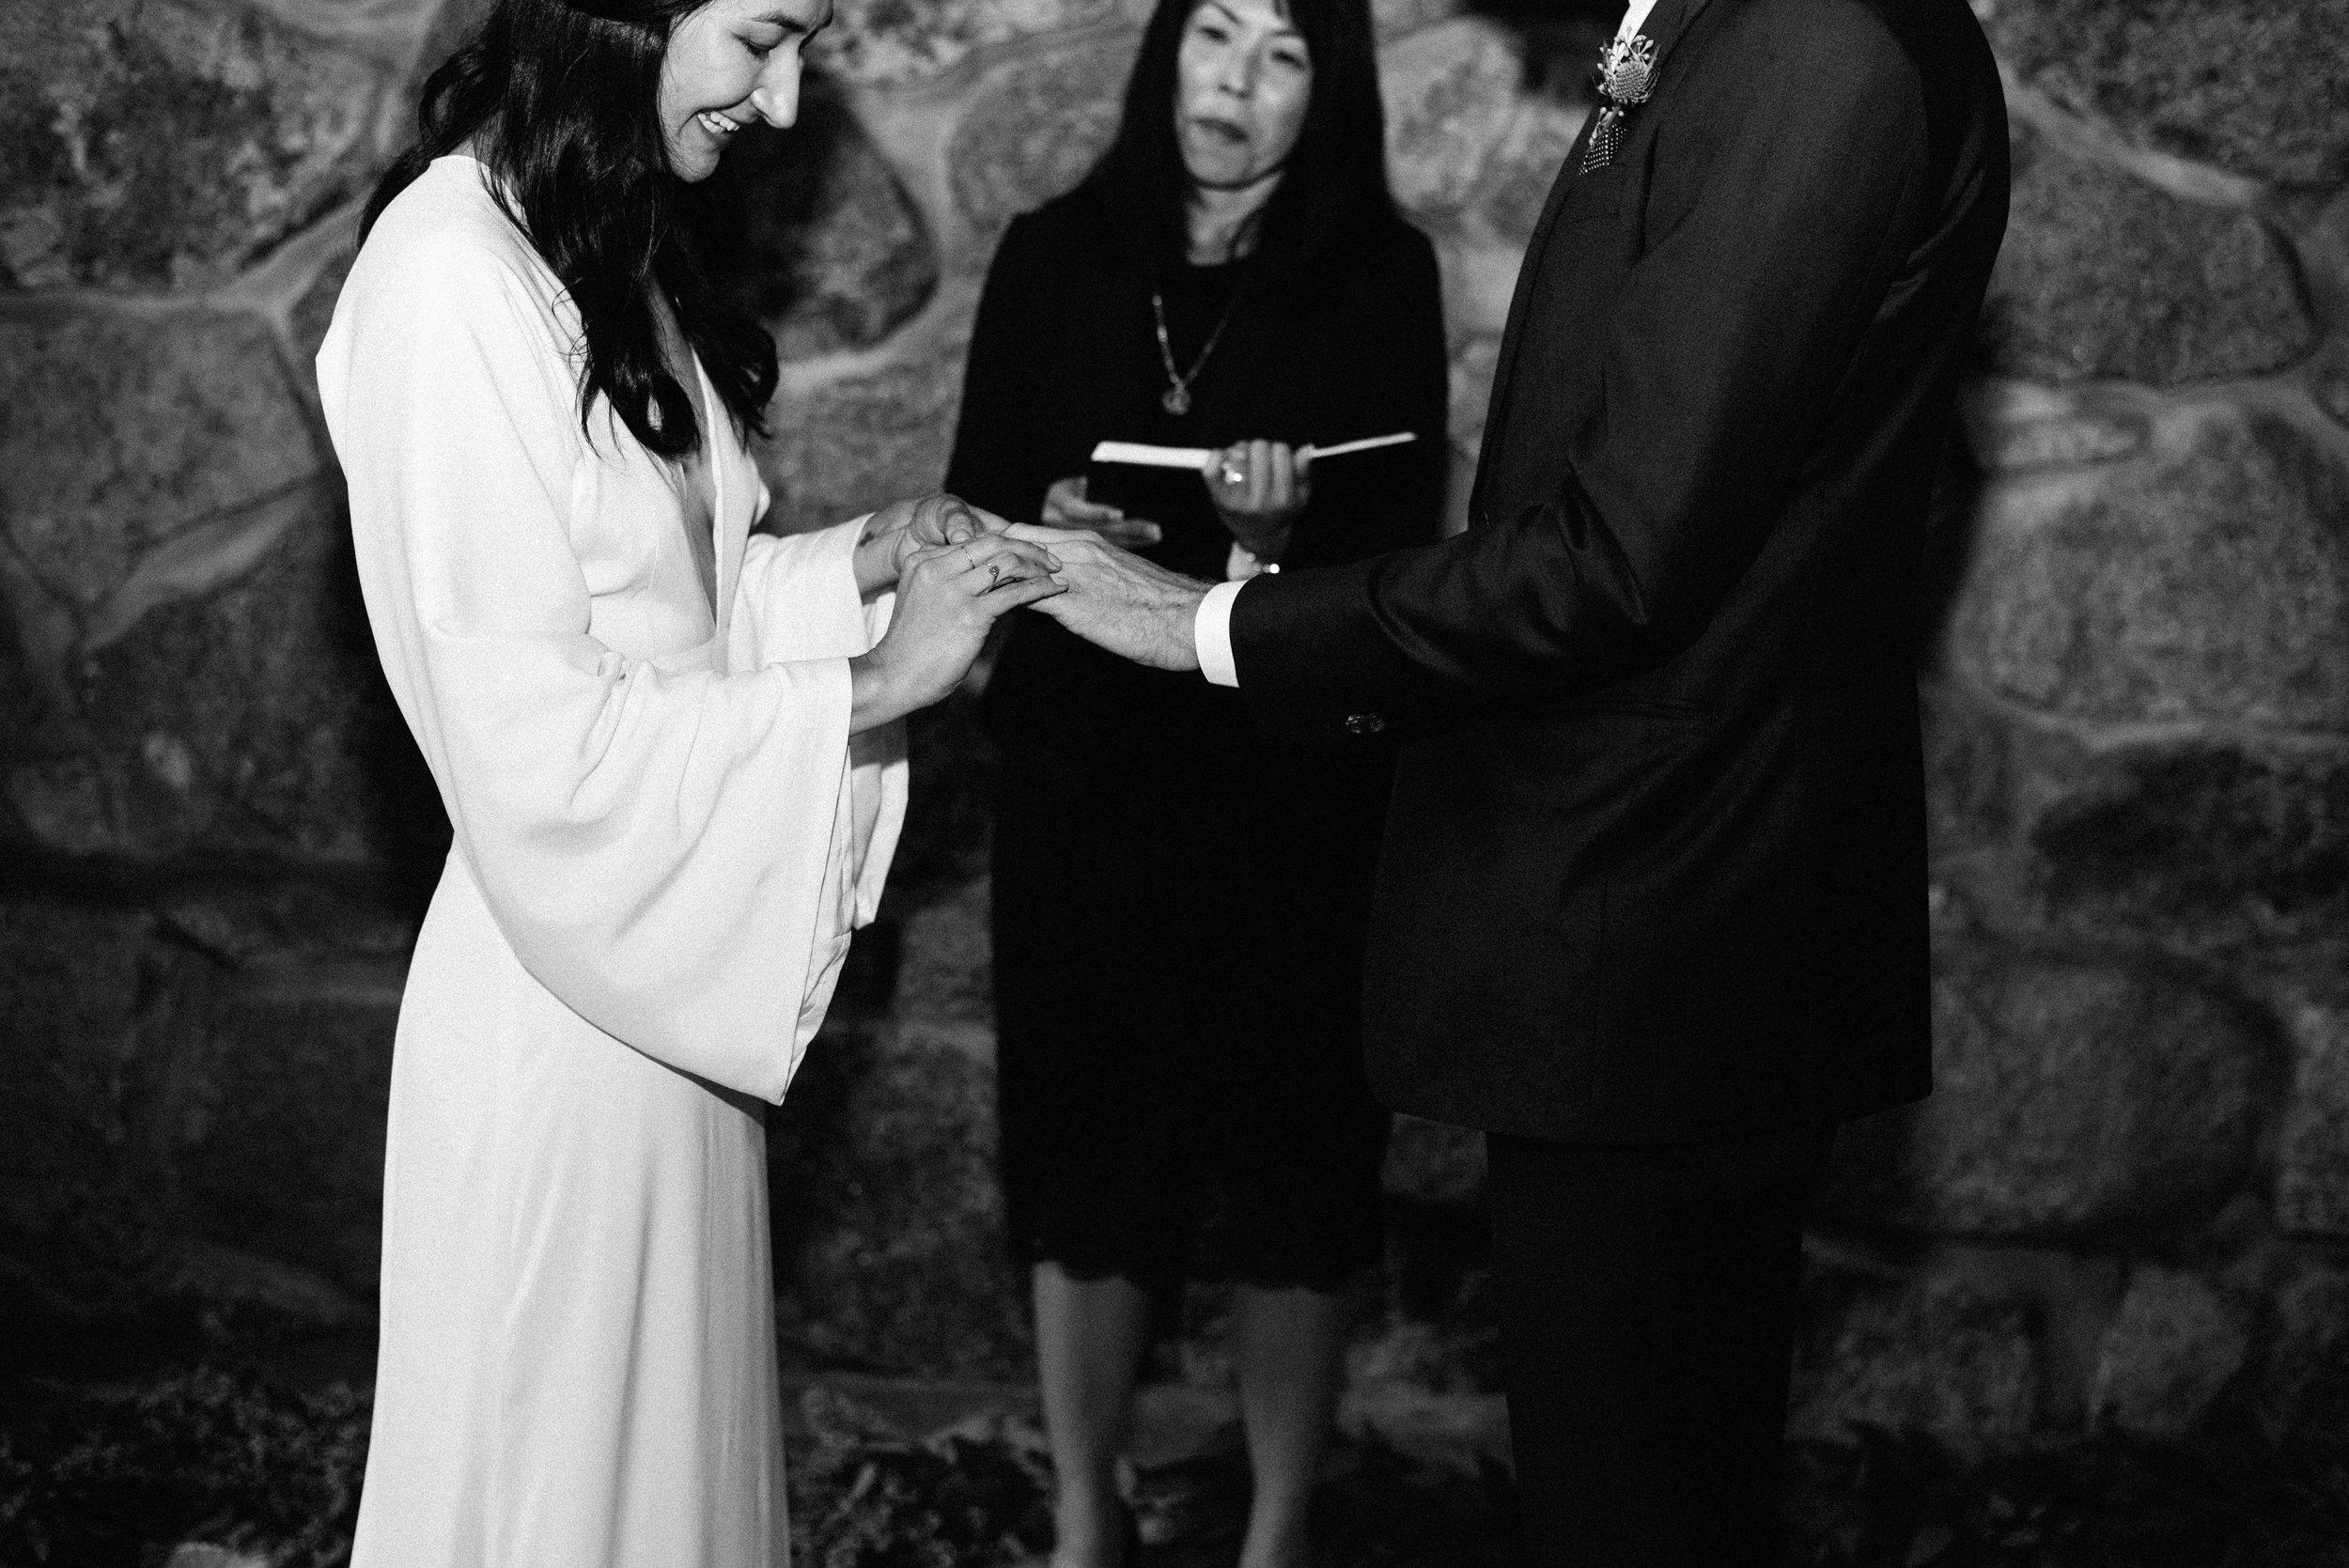 yosemite-wedding-dana-sean-53.jpg